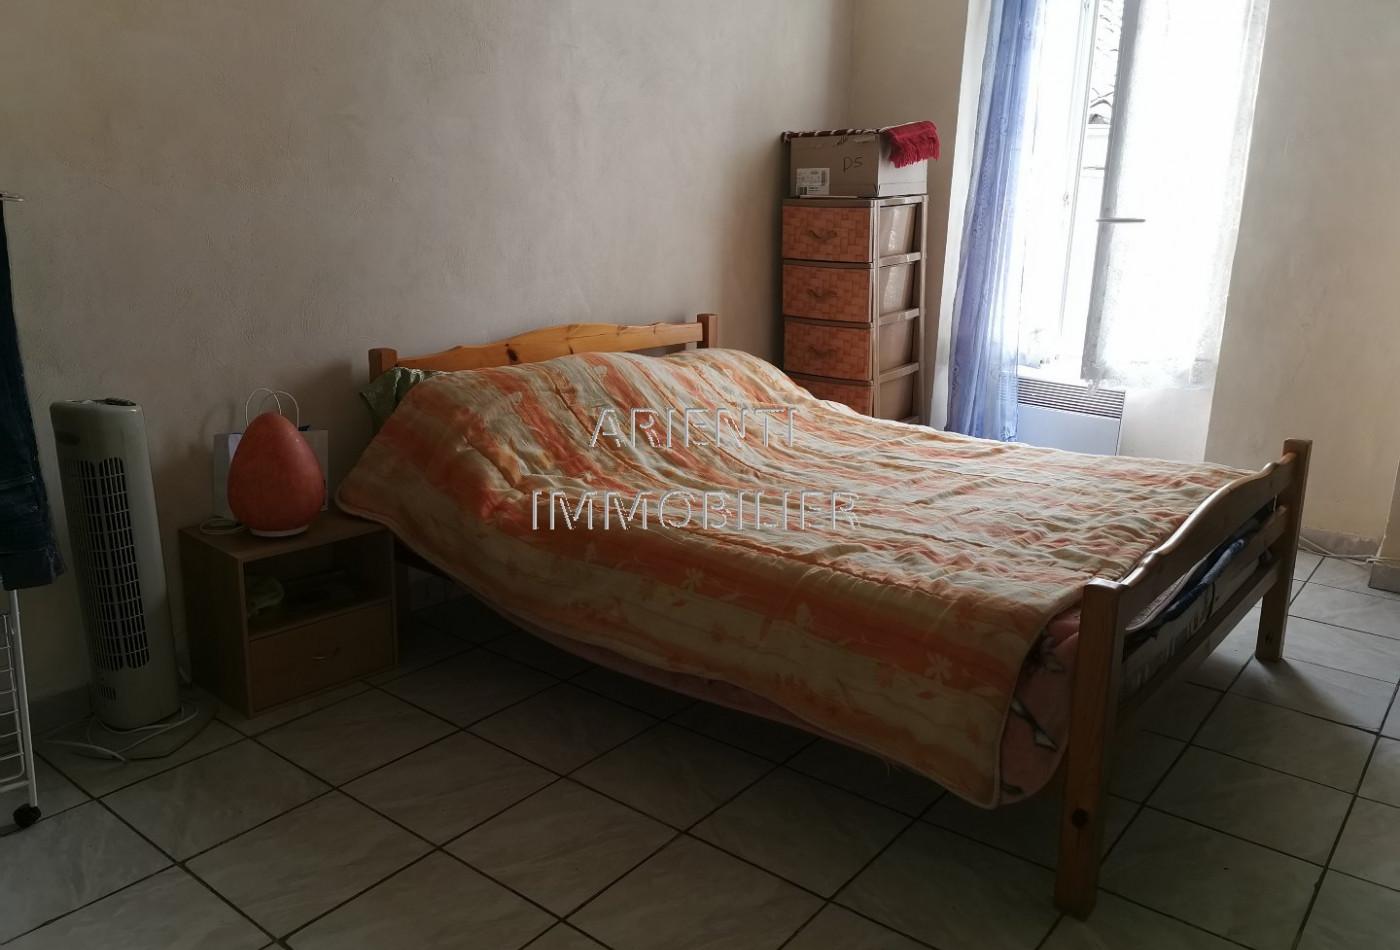 A vendre  Valreas   Réf 260013473 - Office immobilier arienti